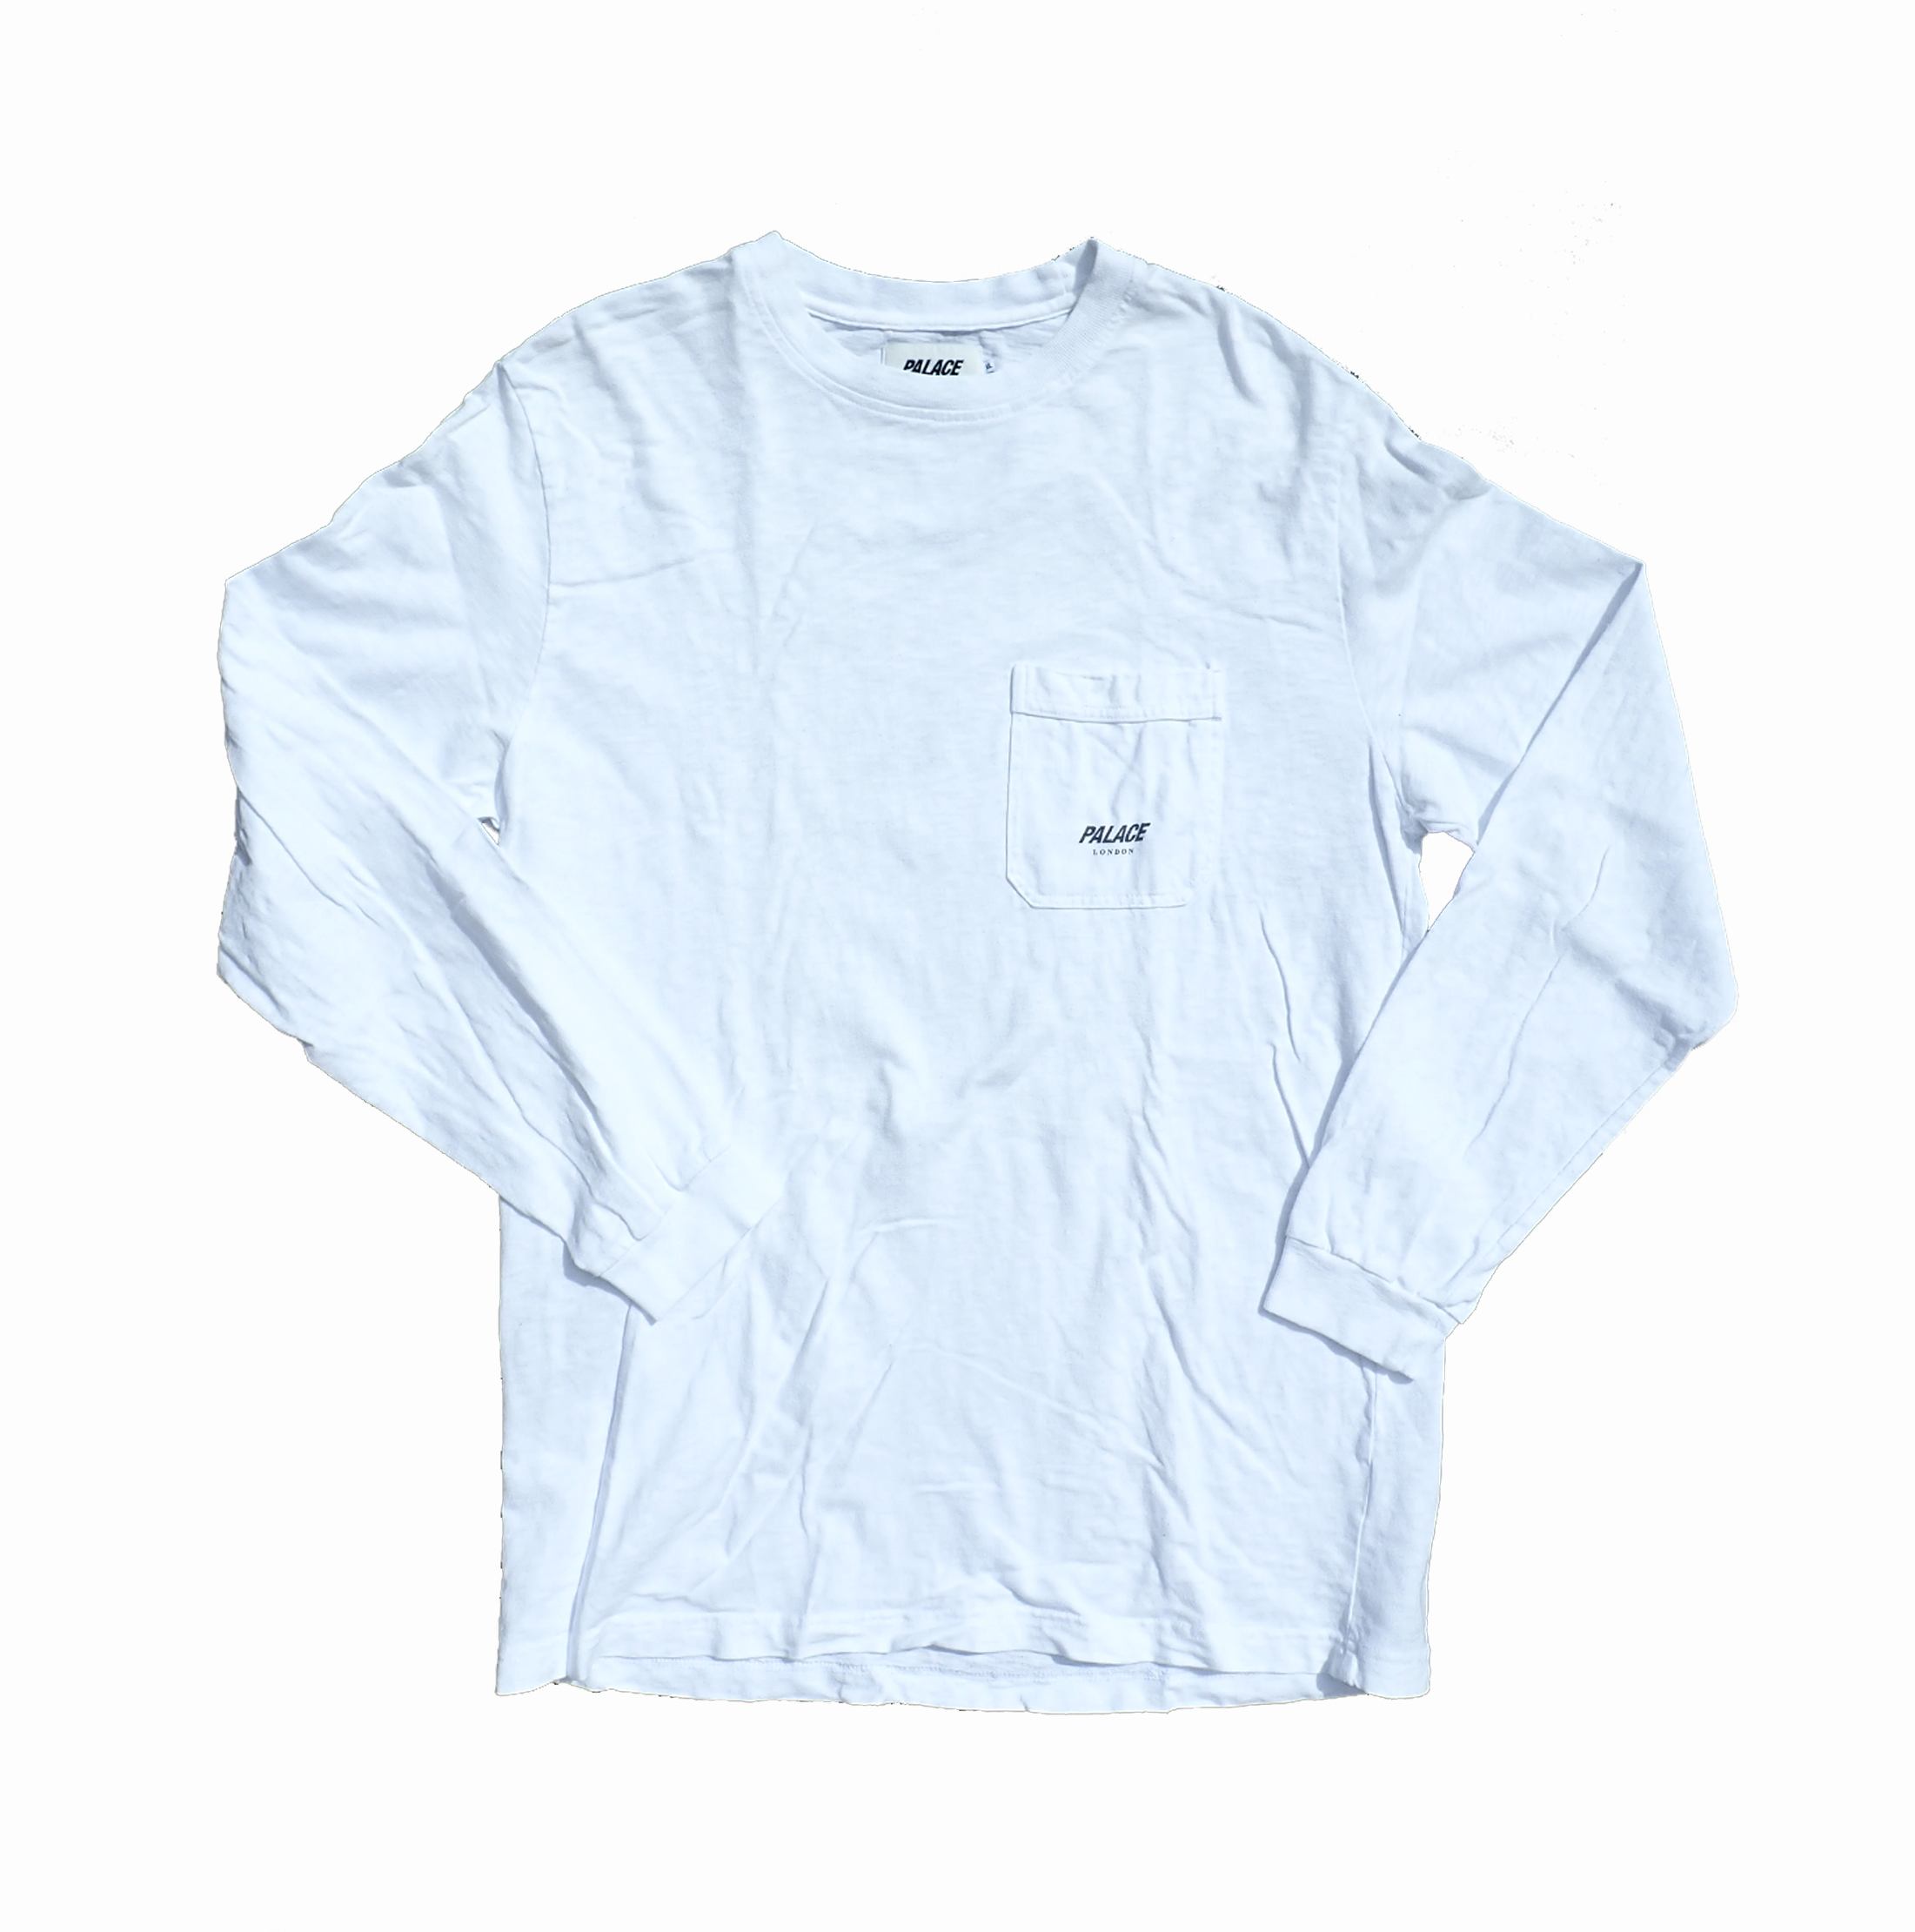 Palace London White Longsleeve T Shirt